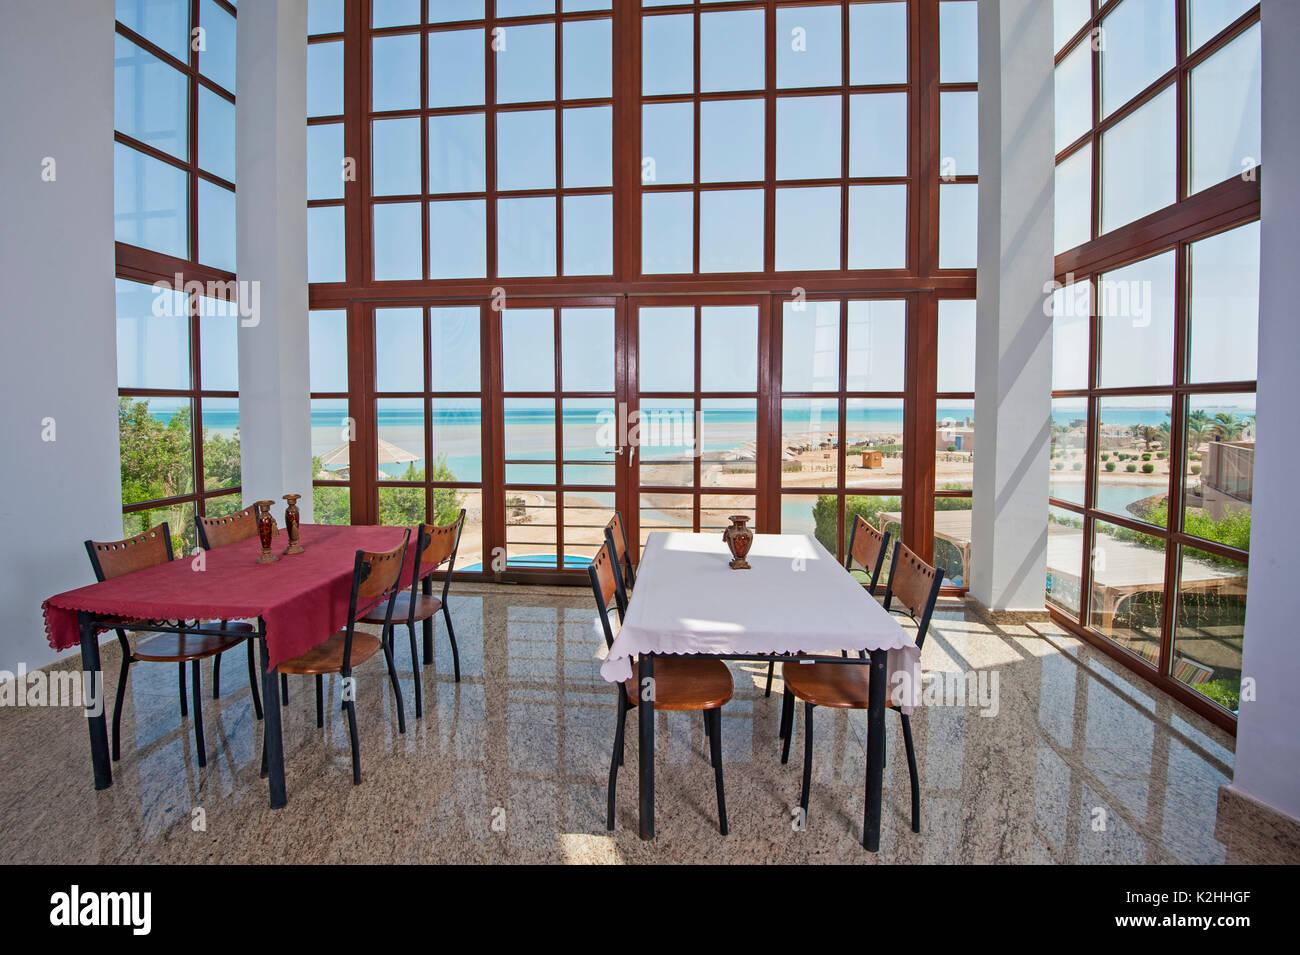 Dining area in luxury villa show home showing interior design decor ...